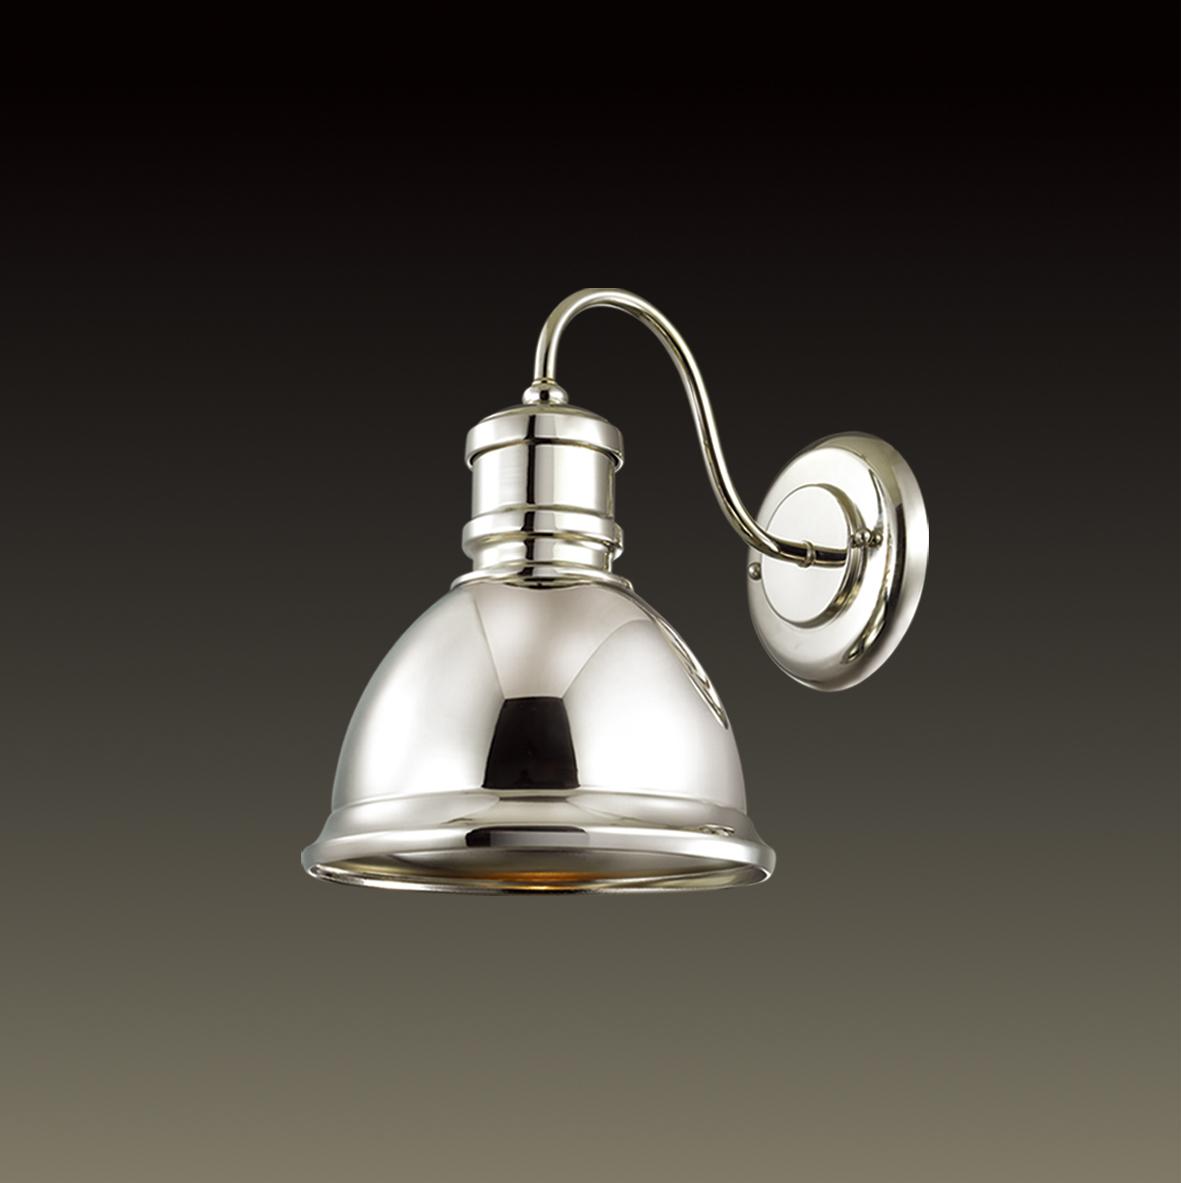 Бра Odeon Light Talva 2901/1W, 1xE27x60W, хром, металл - фото 1